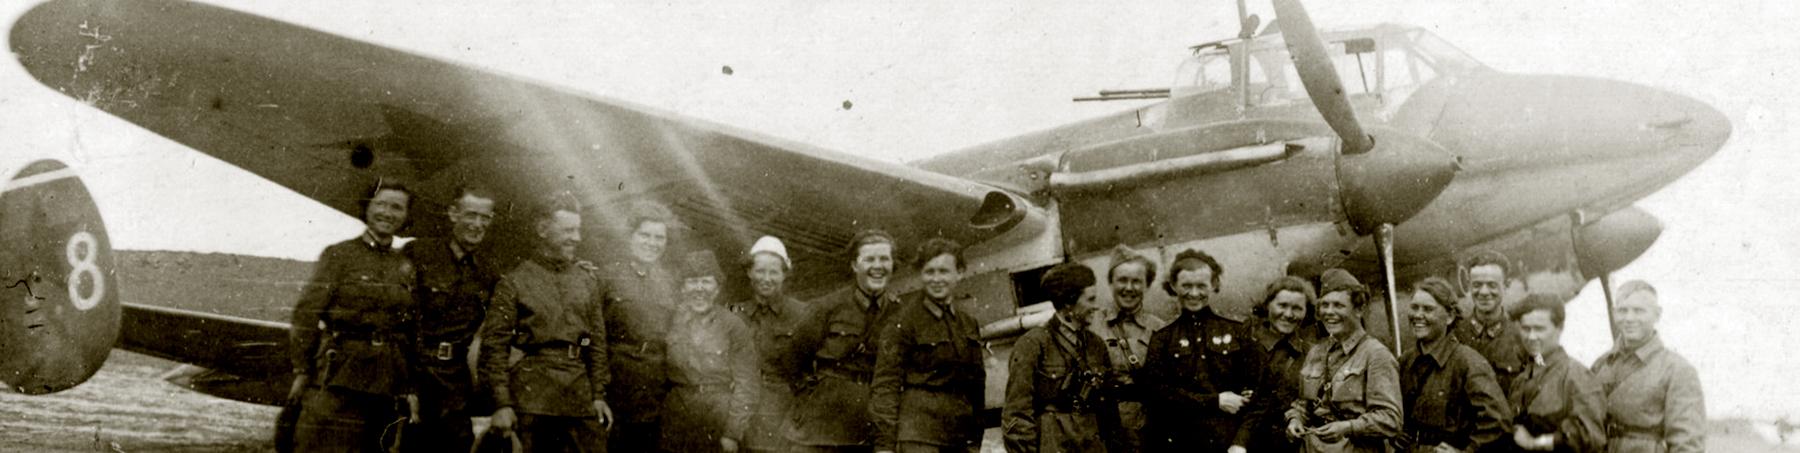 Petlyakov Pe 2 587BAP White 8 group photo with their female crews 01